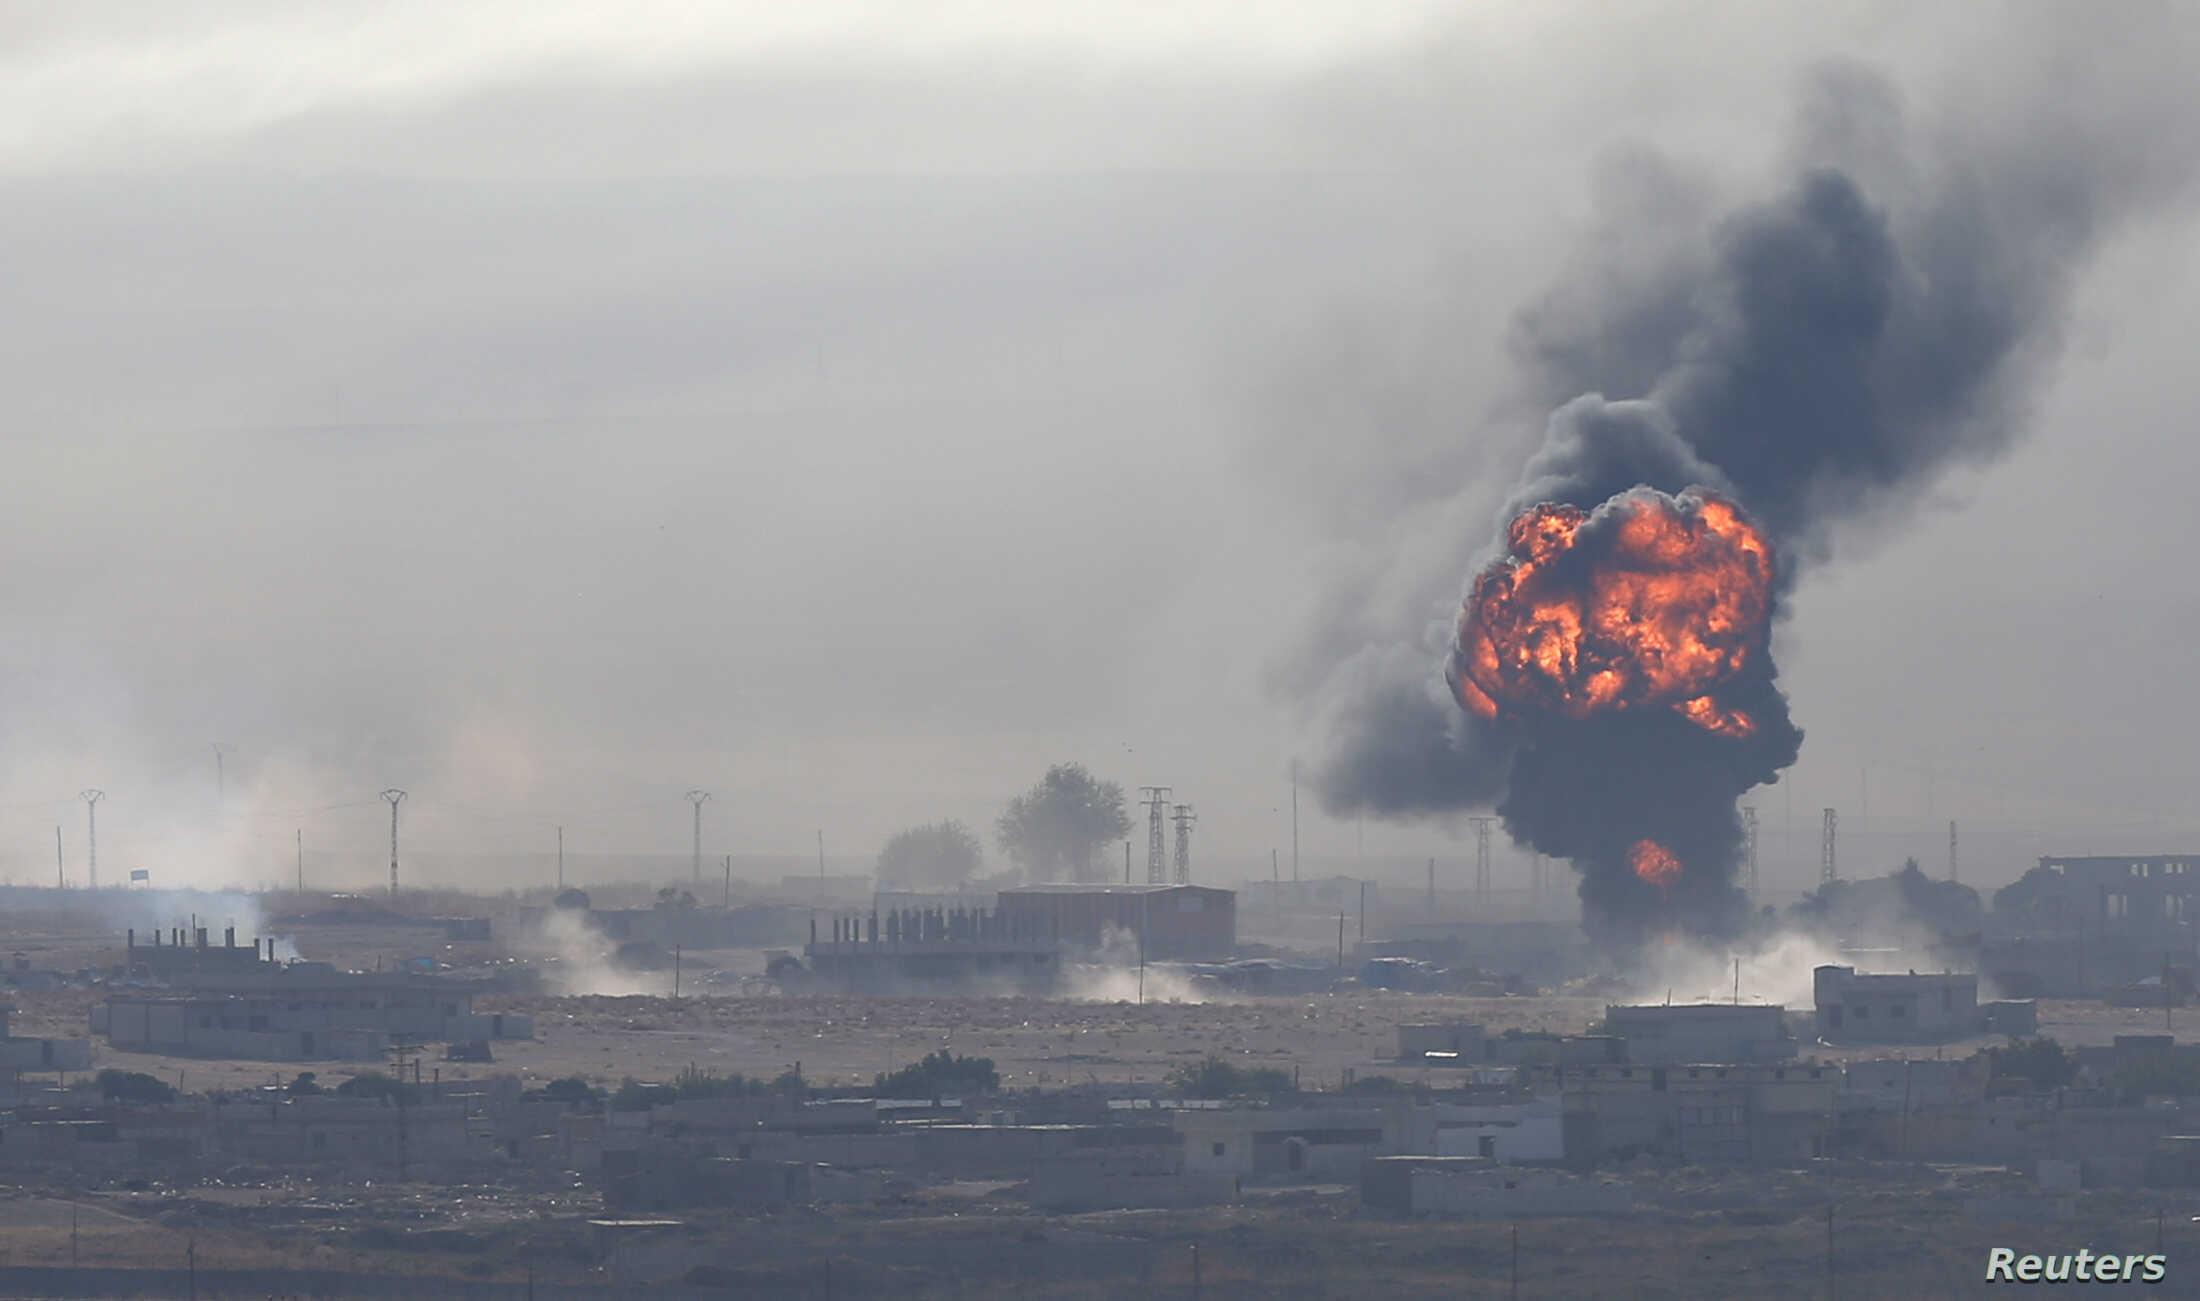 Explosions Kill 2 Turkish Soldiers in Syria's Idlib